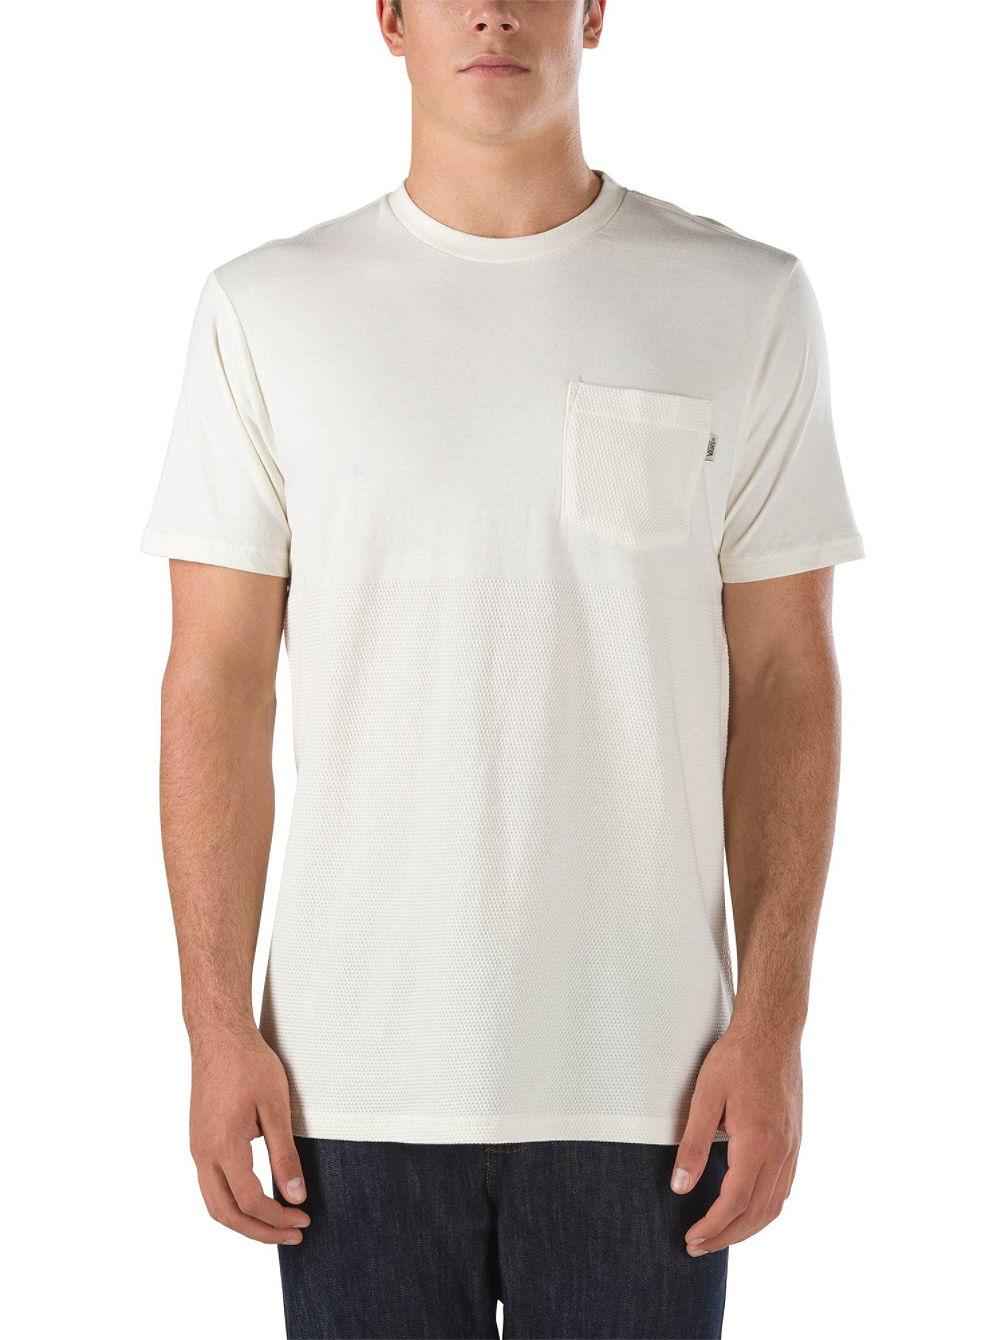 vans-granger-t-shirt